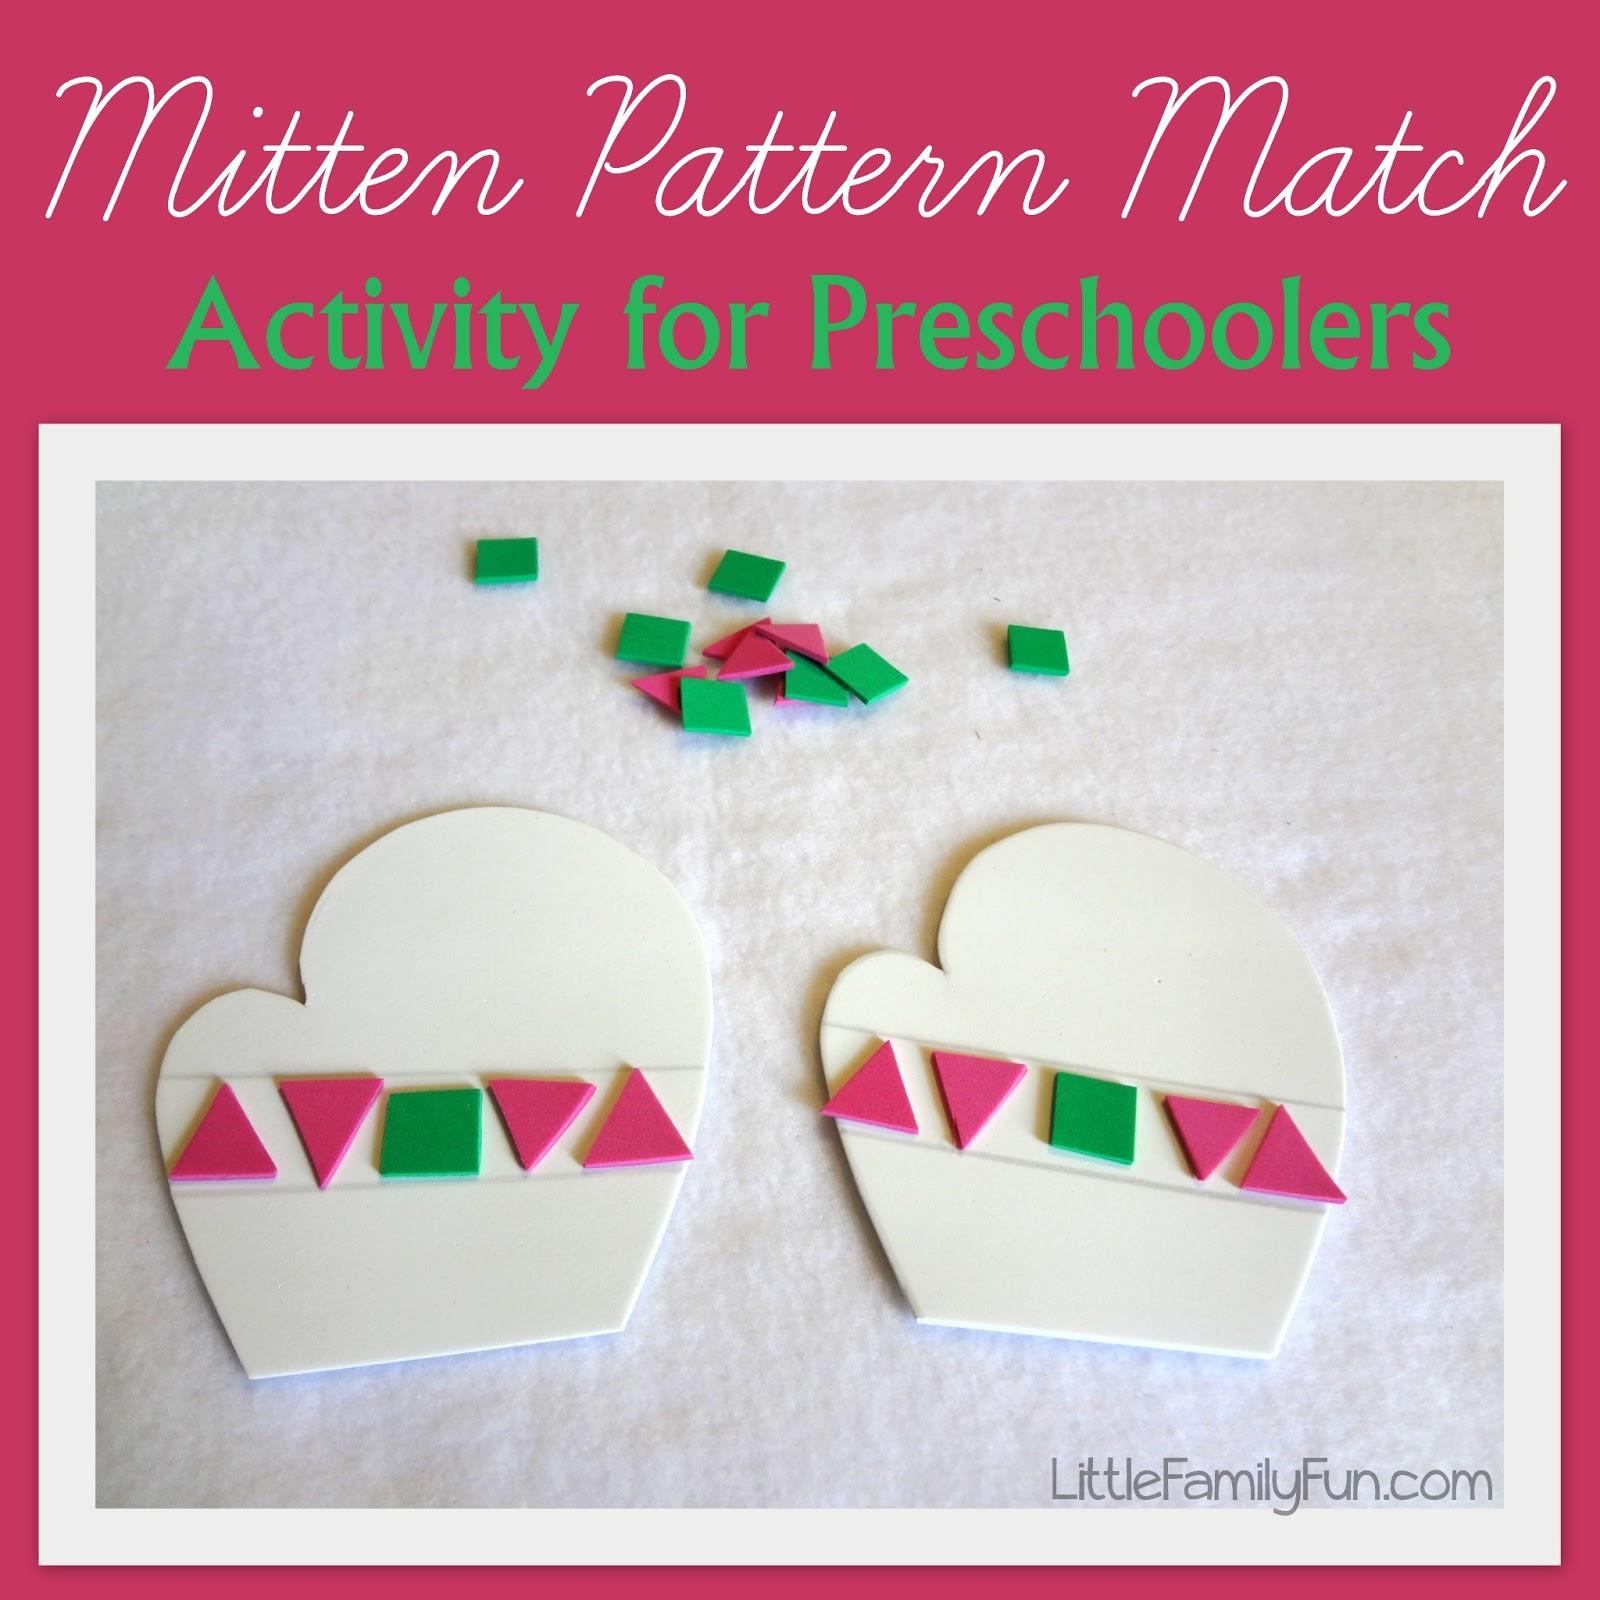 Mitten Pattern Match Activity For Preschoolers